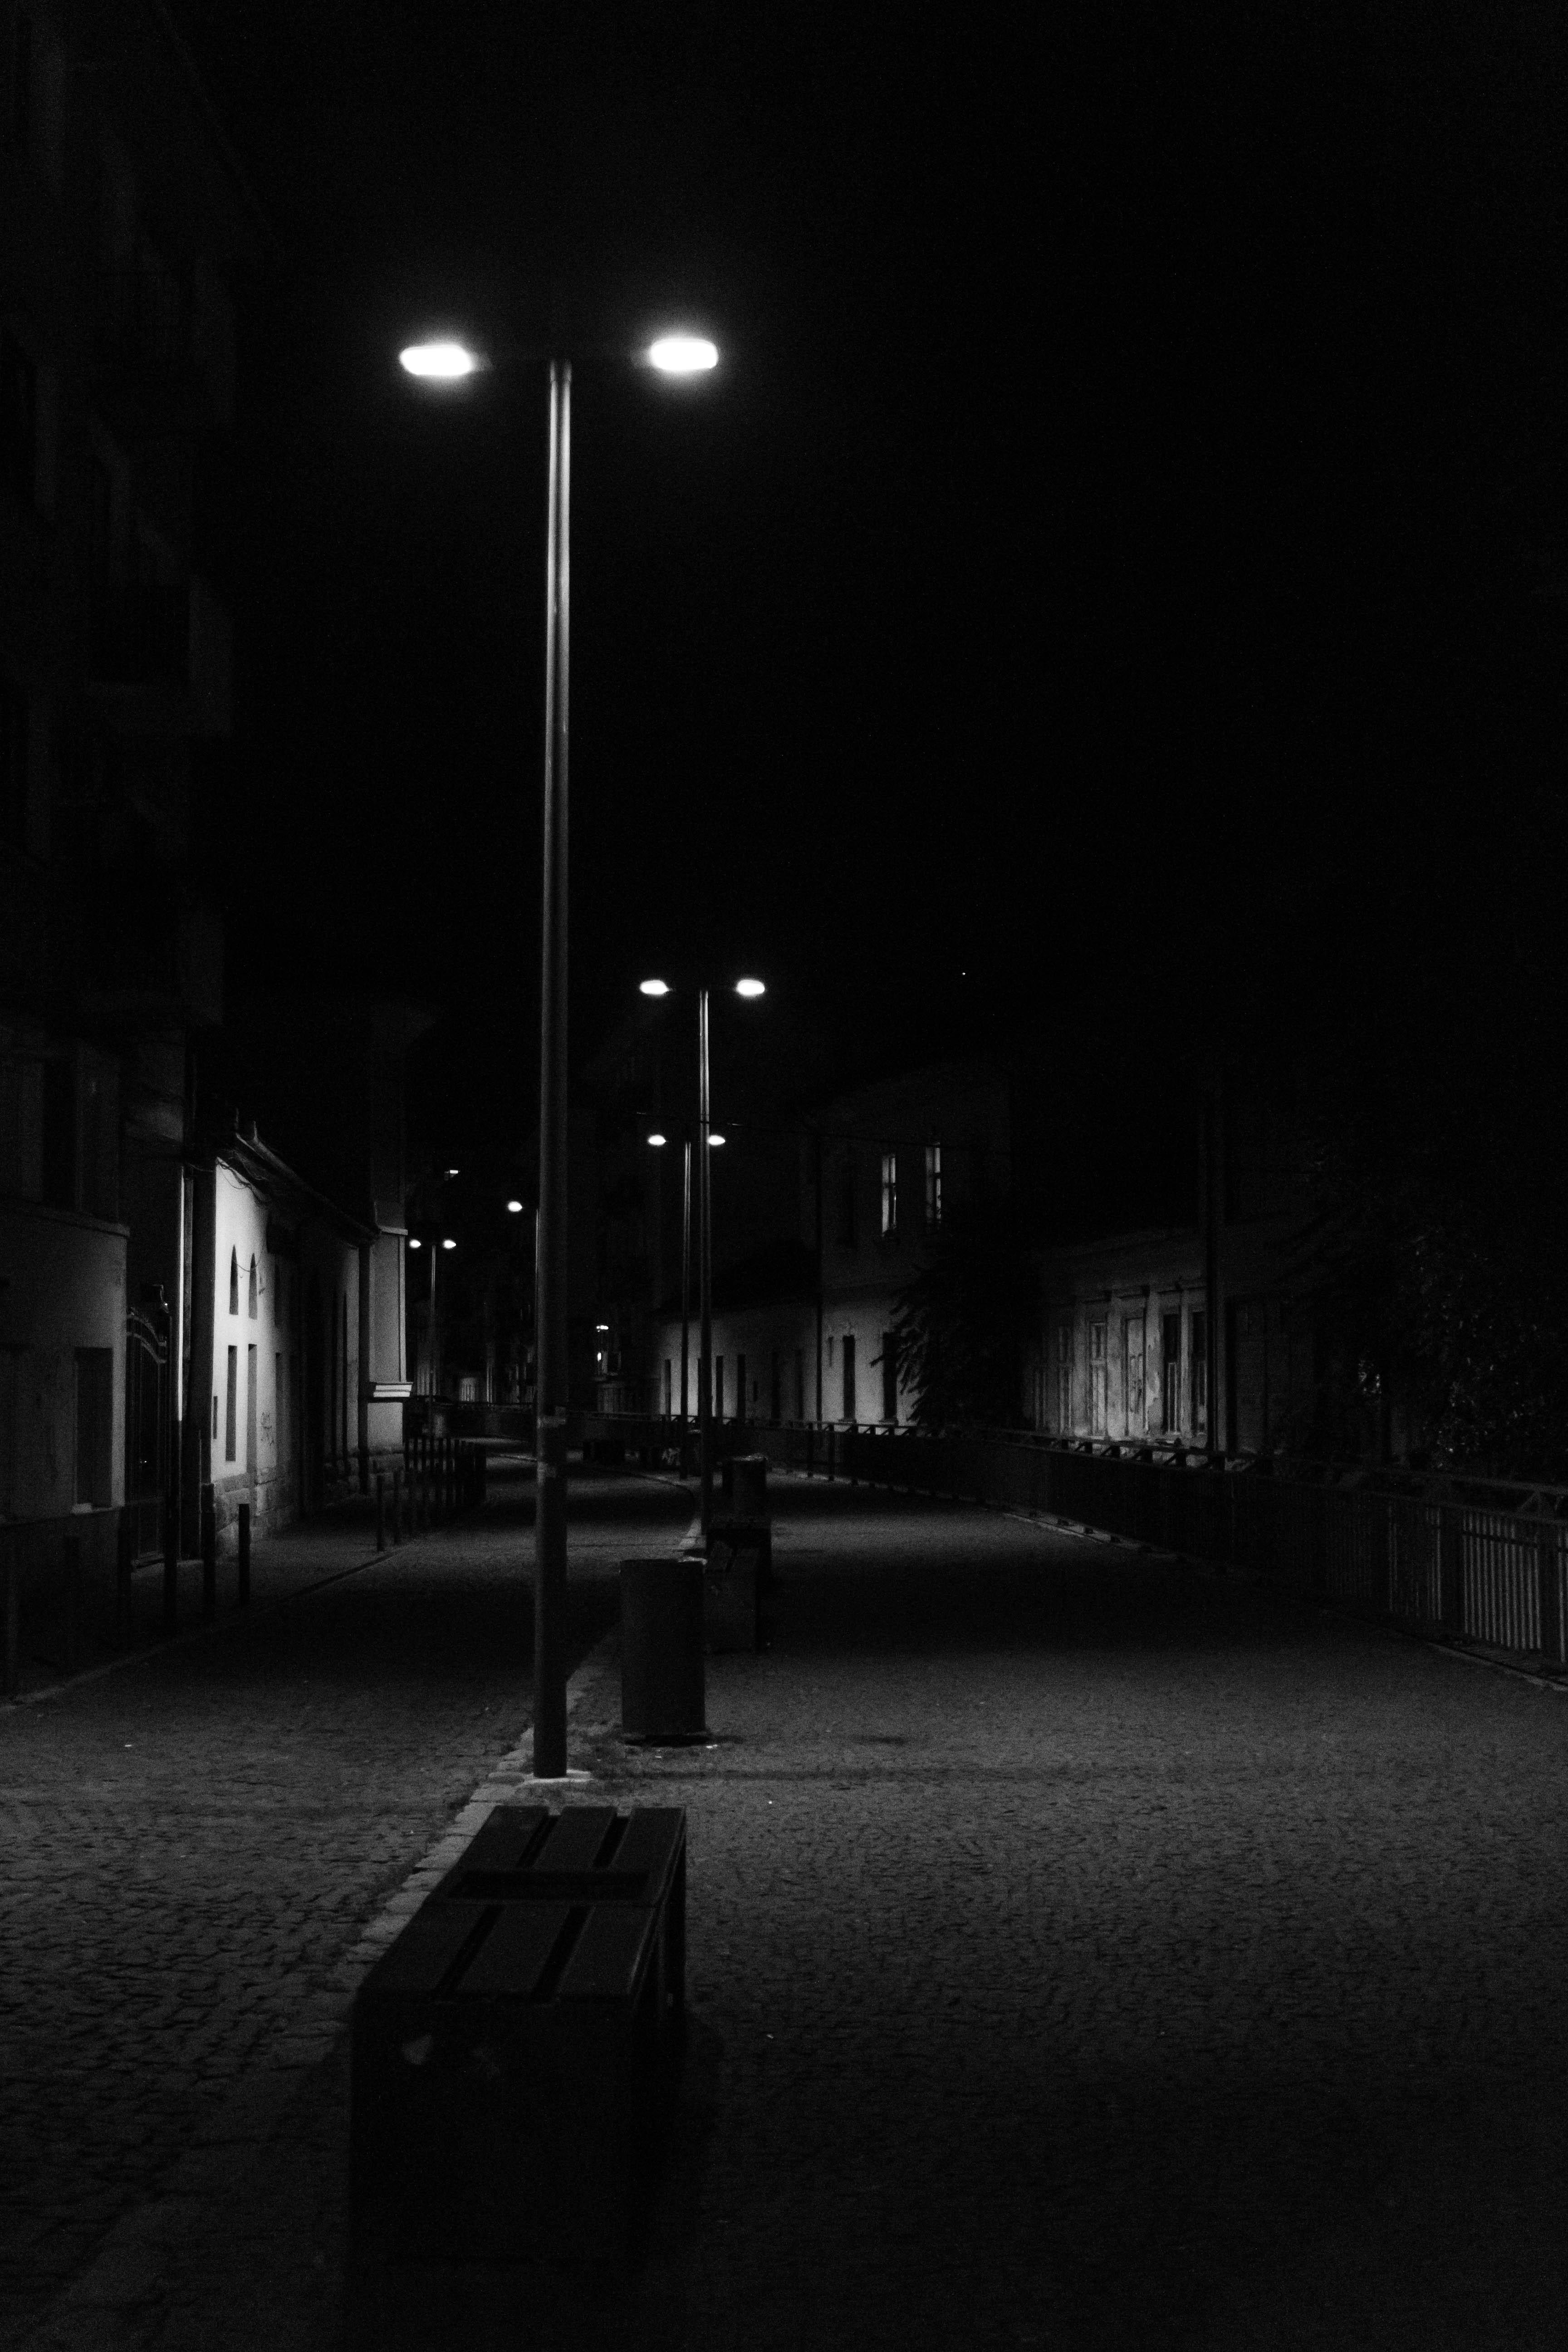 Free Images Street Light Darkness